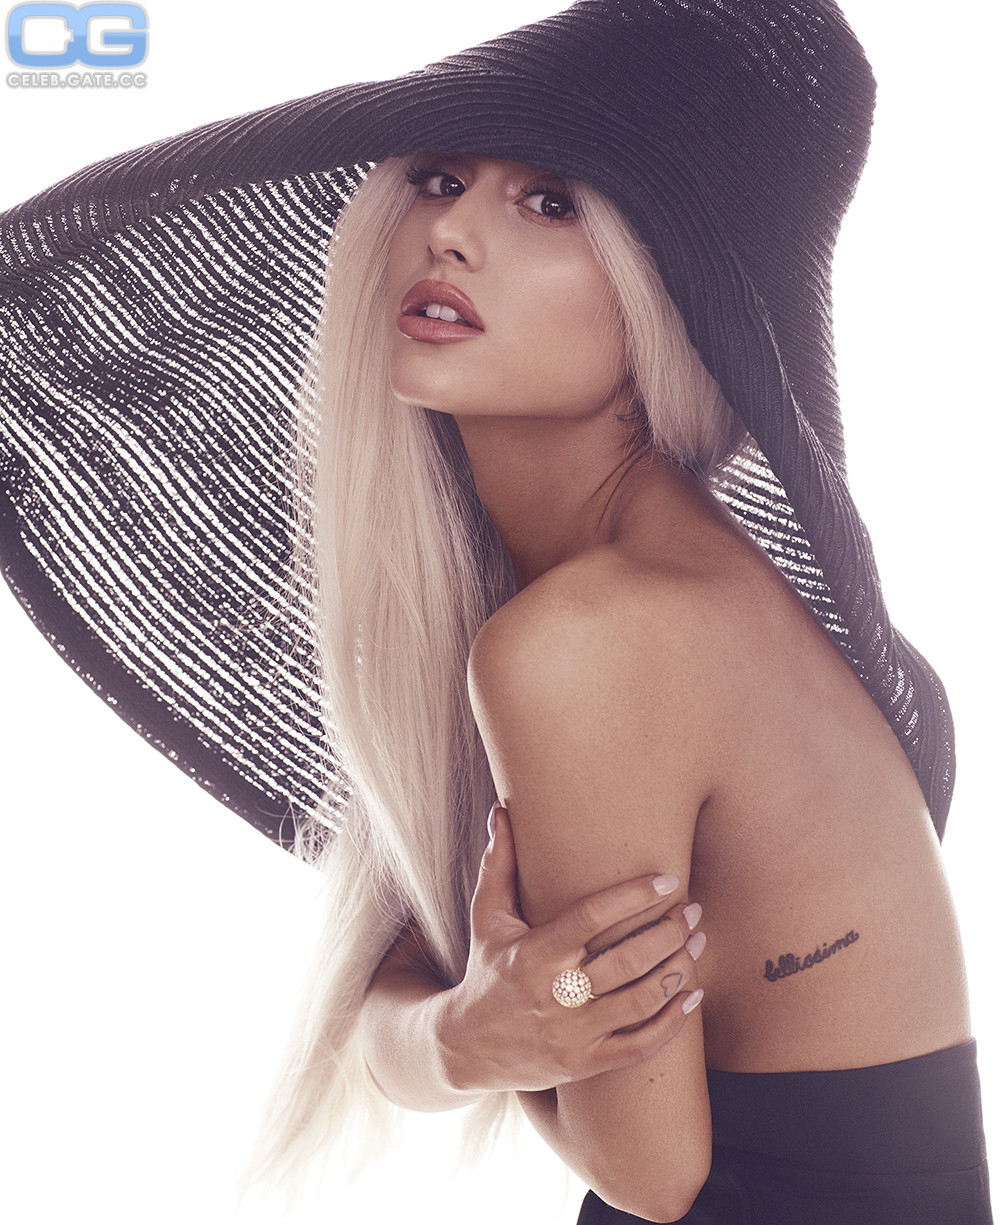 Ariana Grande topless